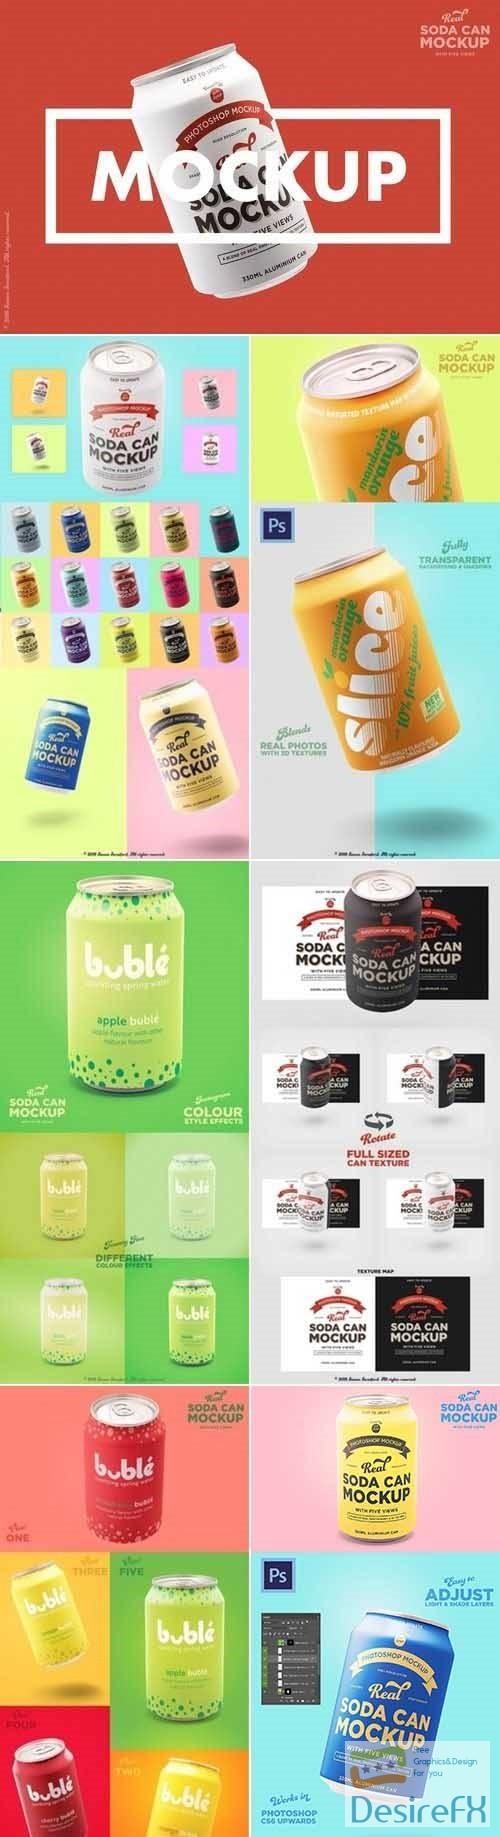 mock-up - Tin soda can mockup branding designs - 2954747